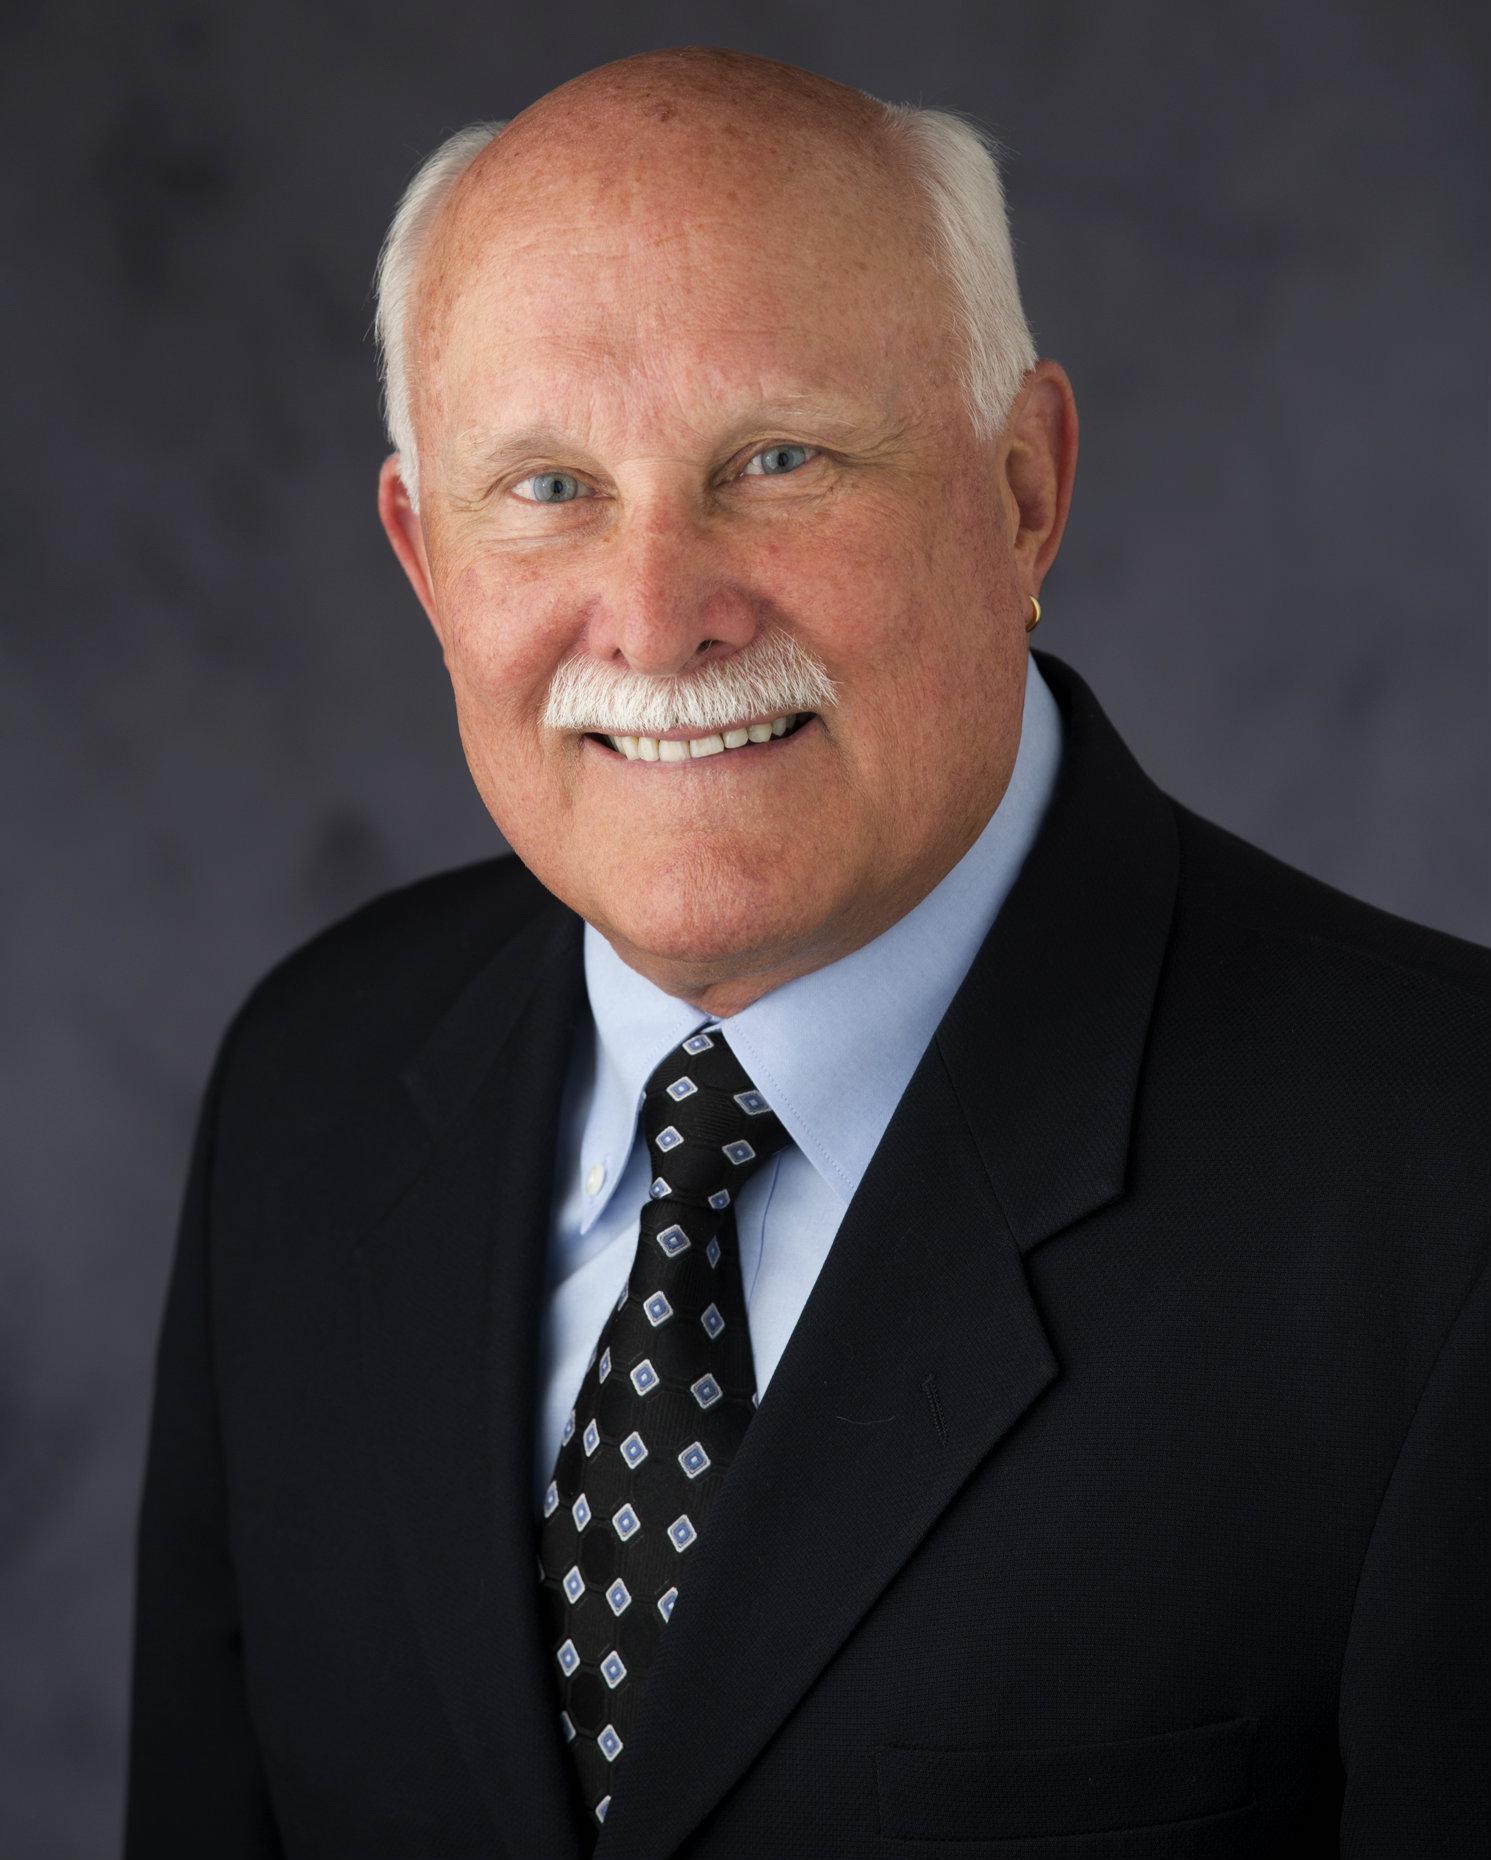 Jim Walberg